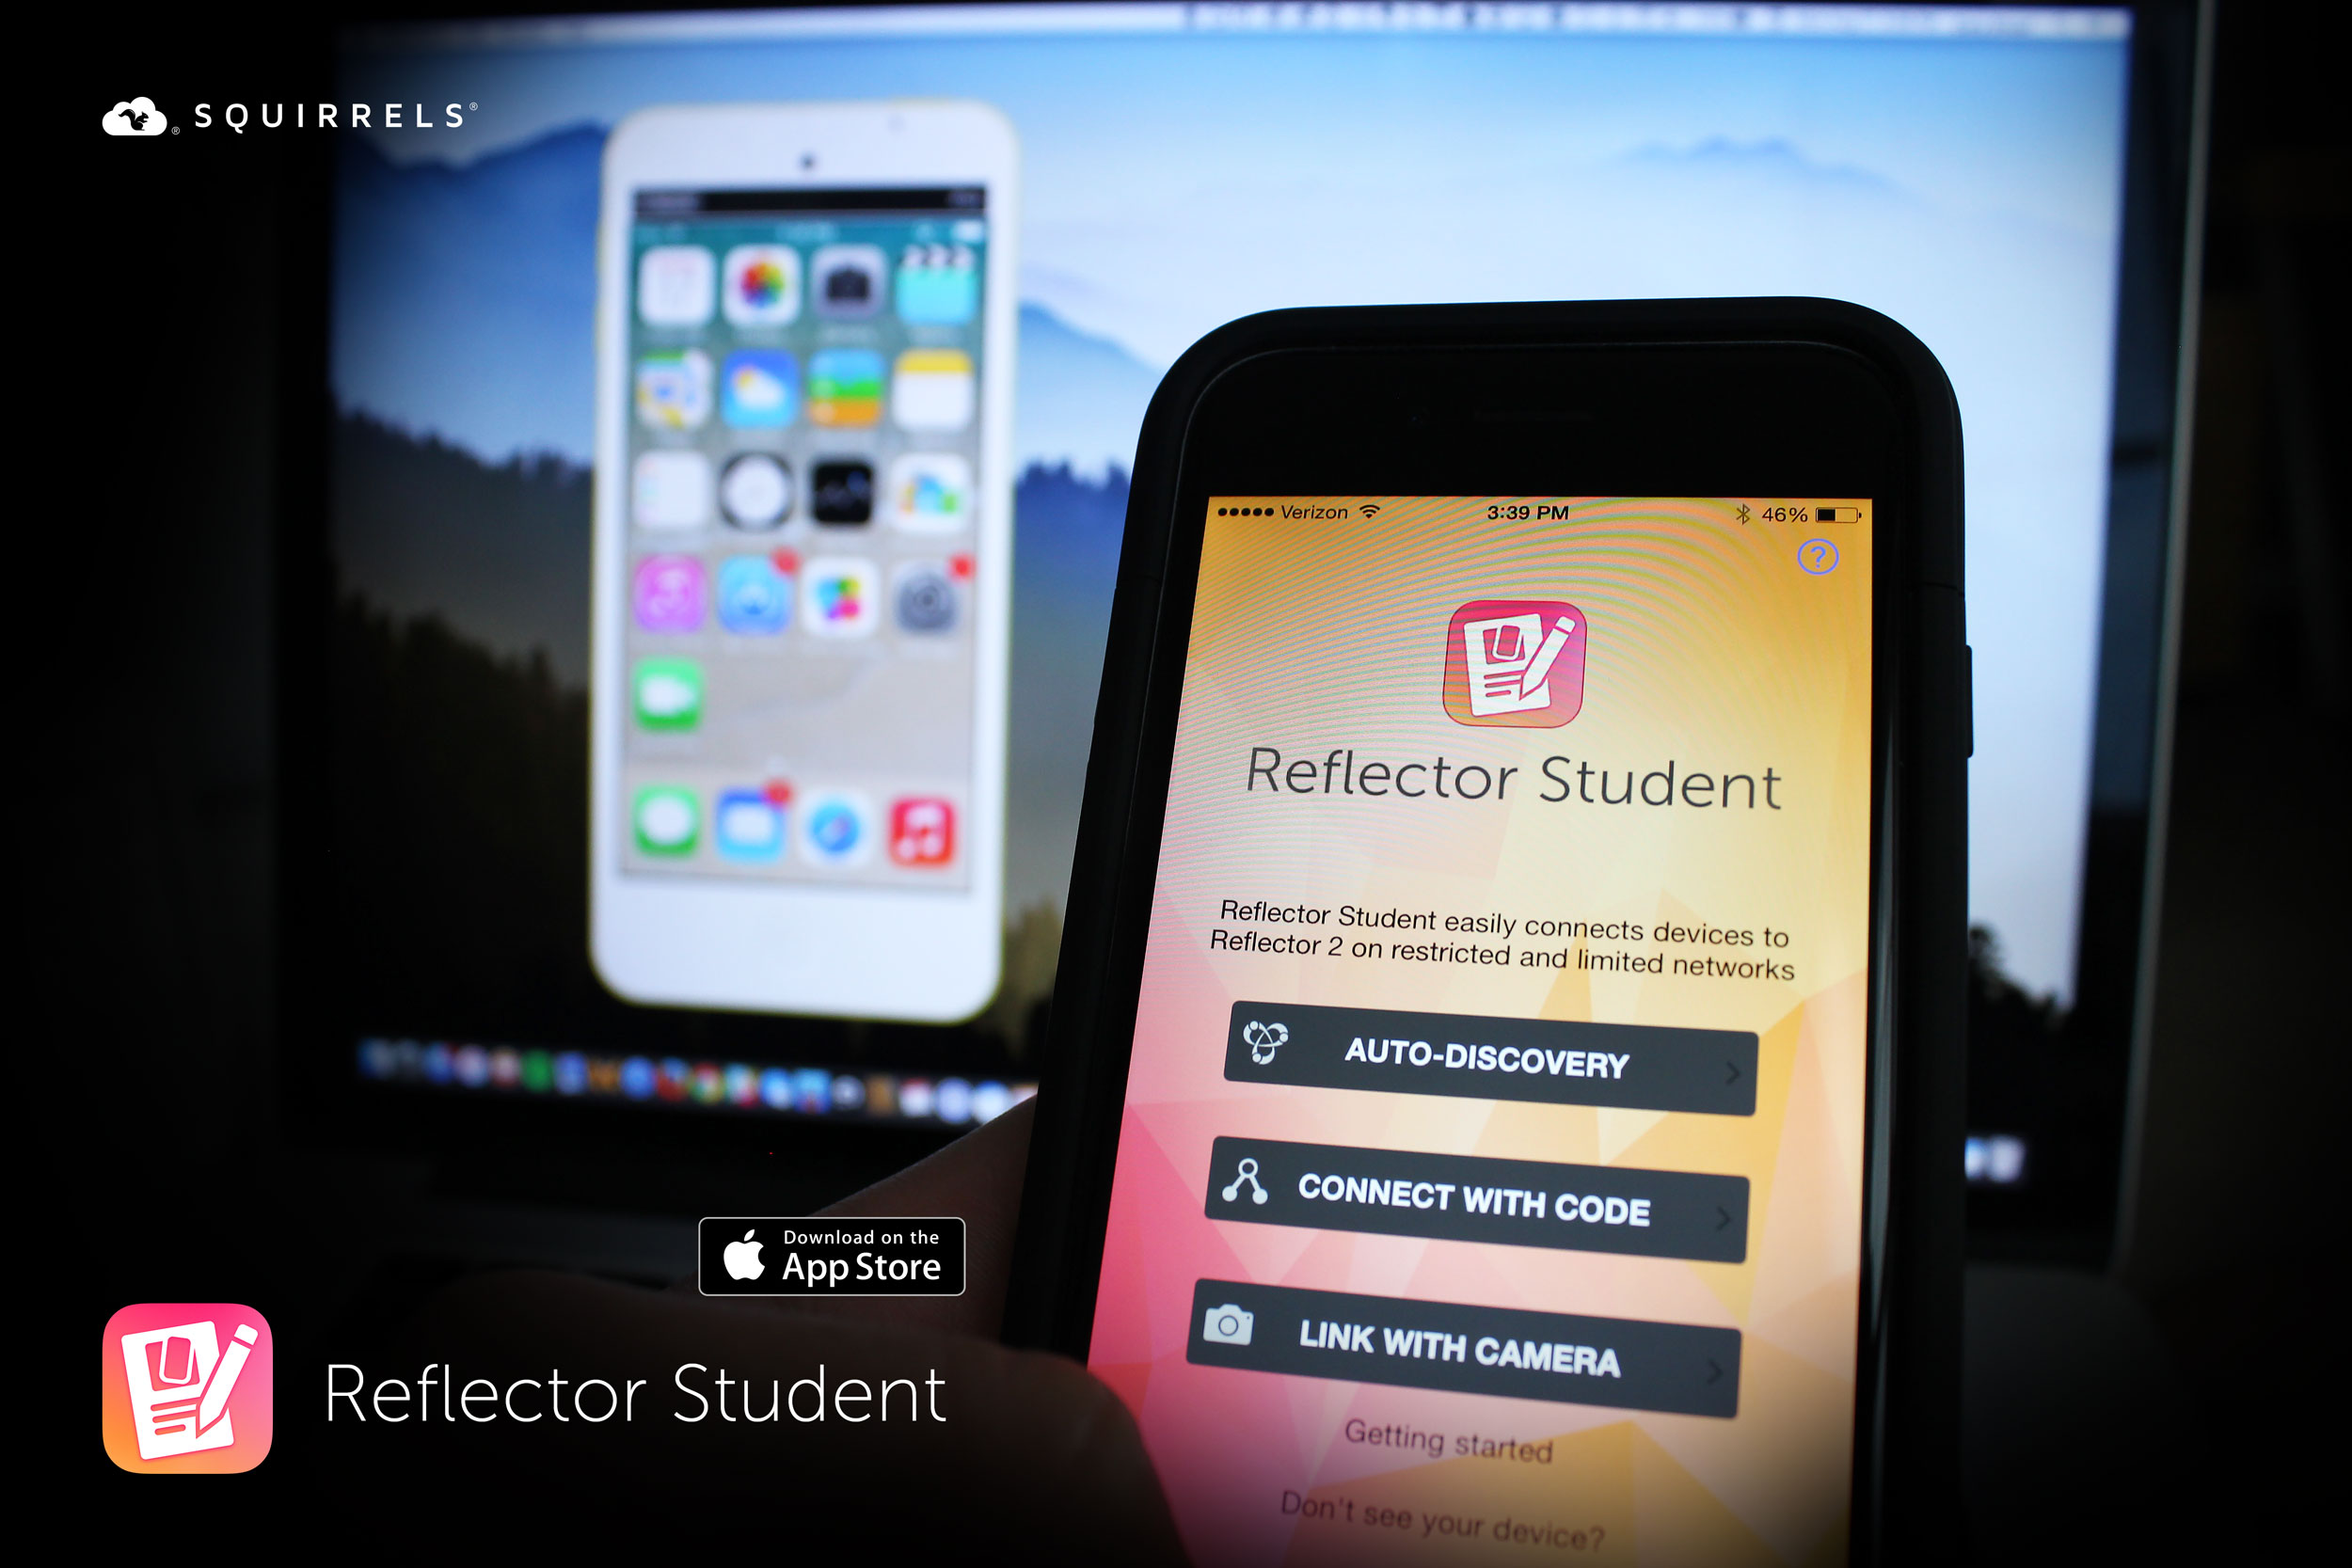 Reflector Student